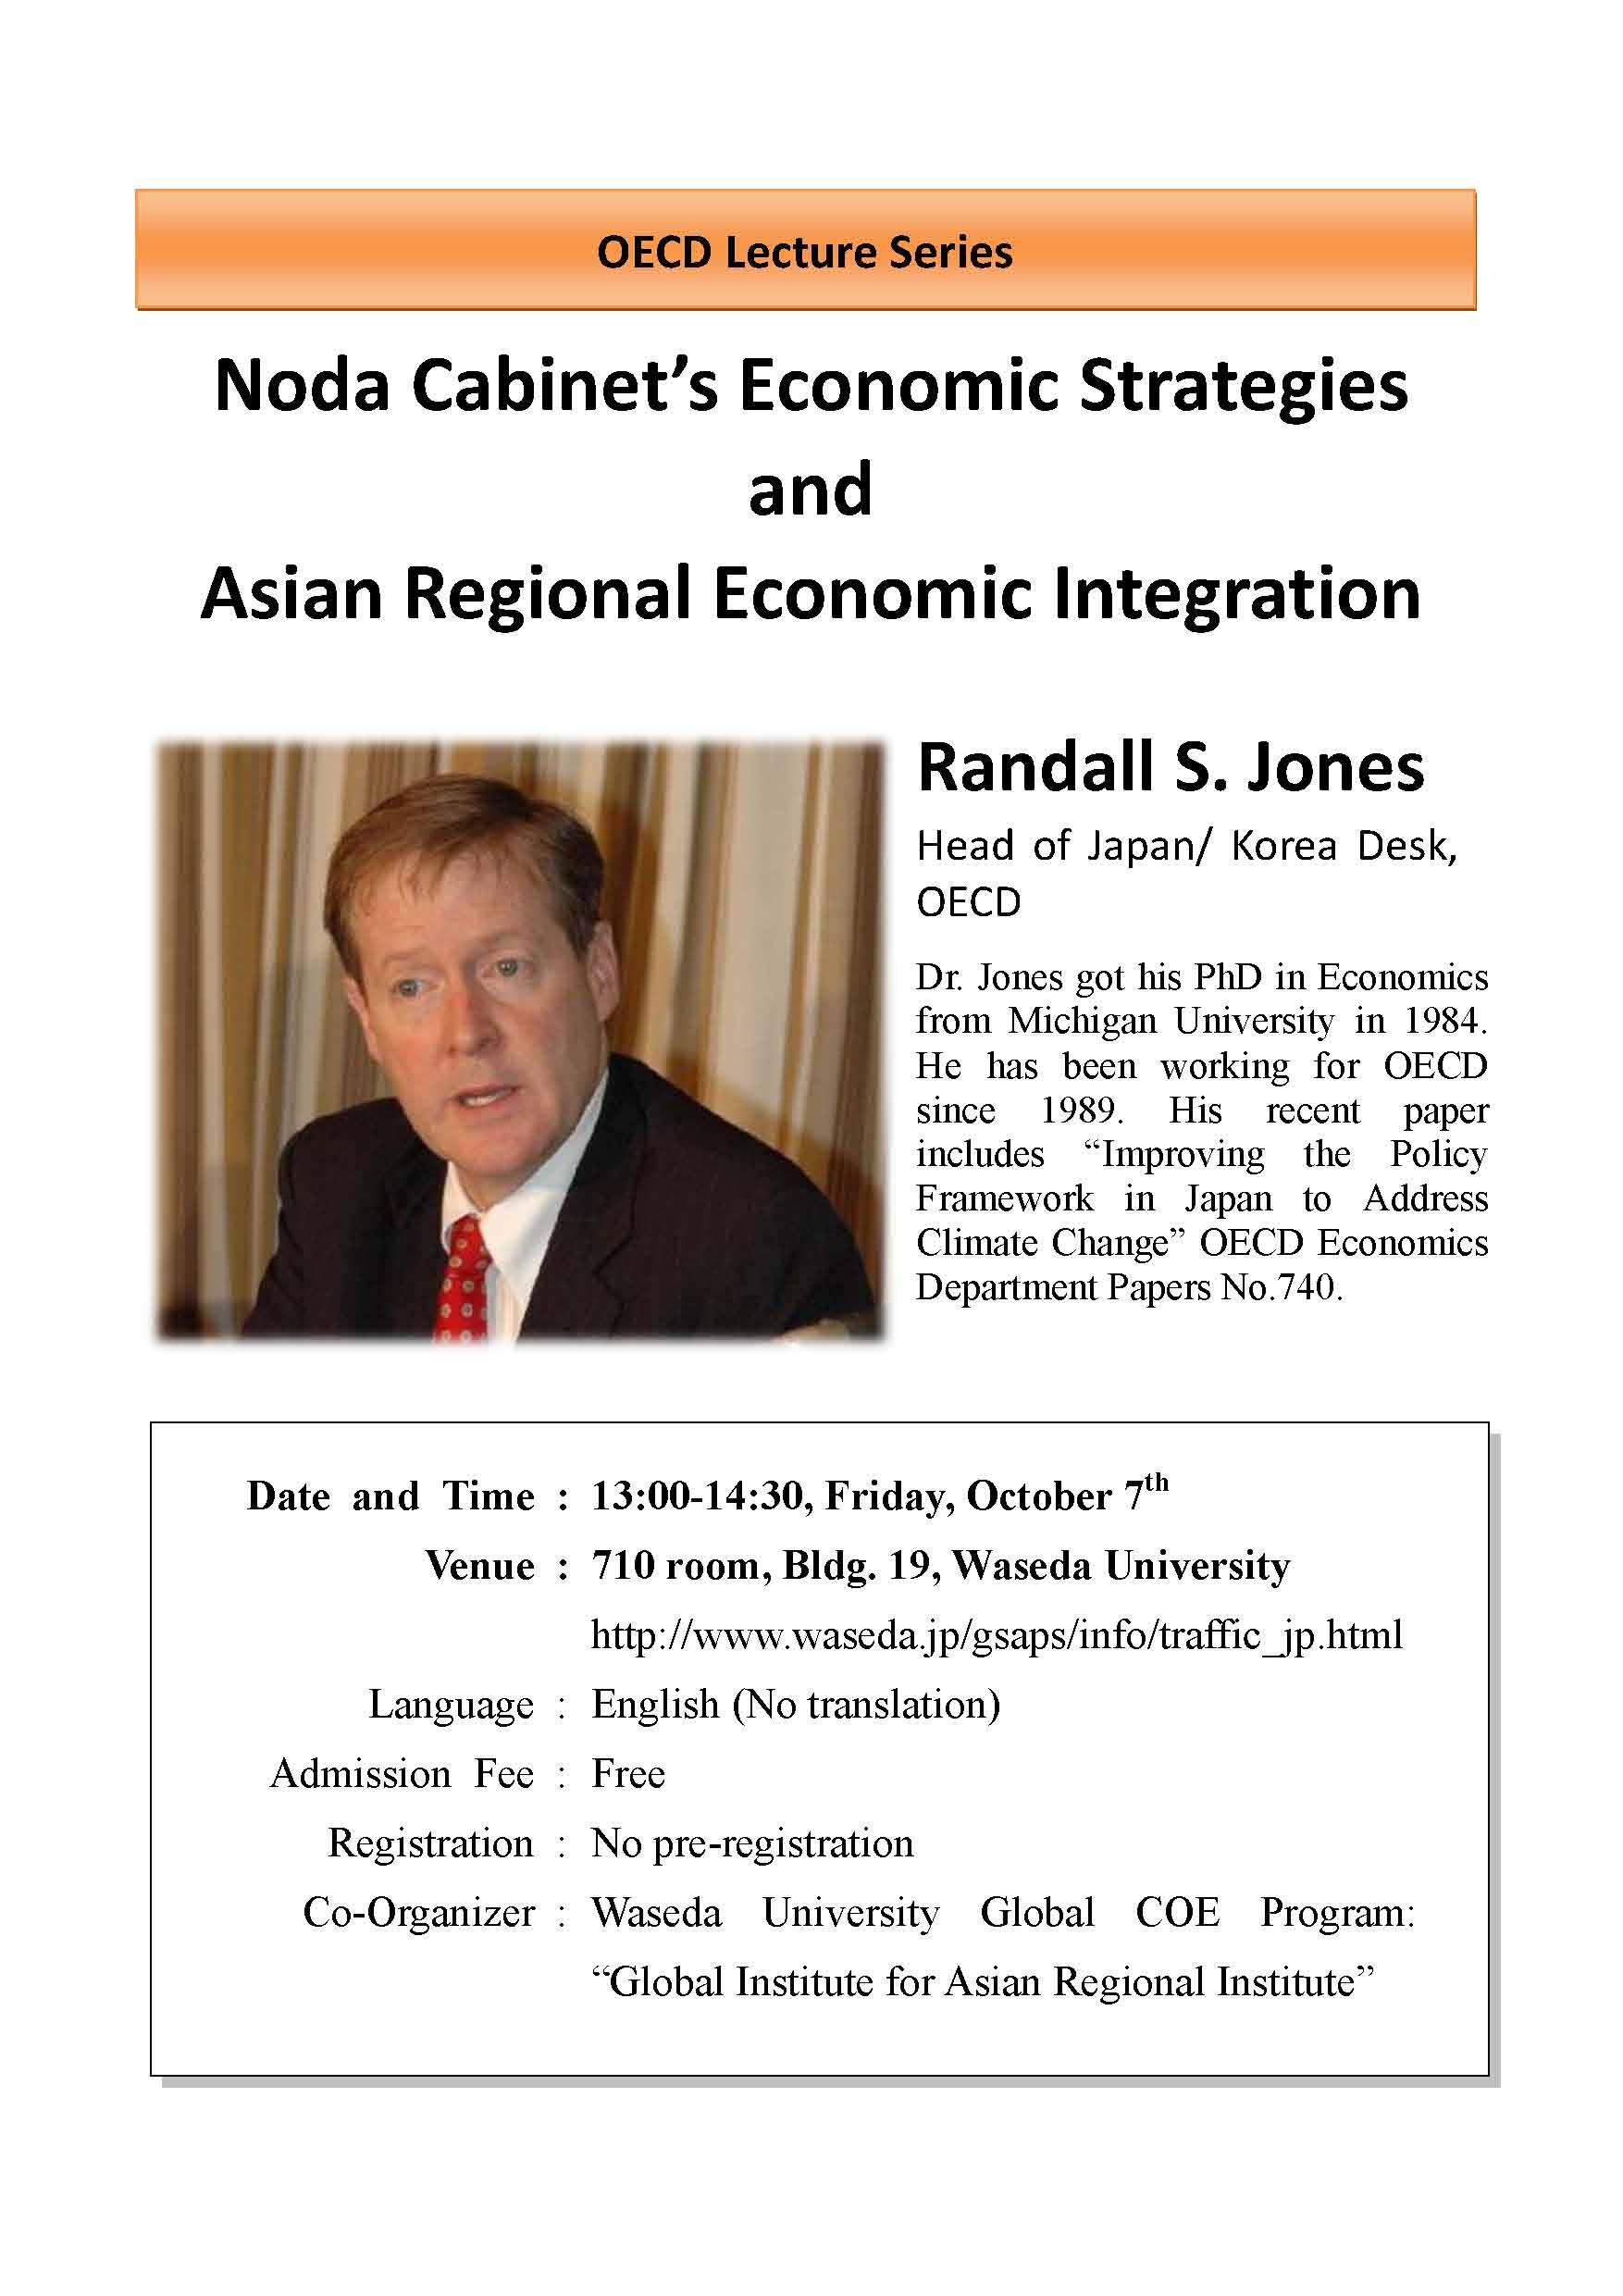 phd thesis on regional integration